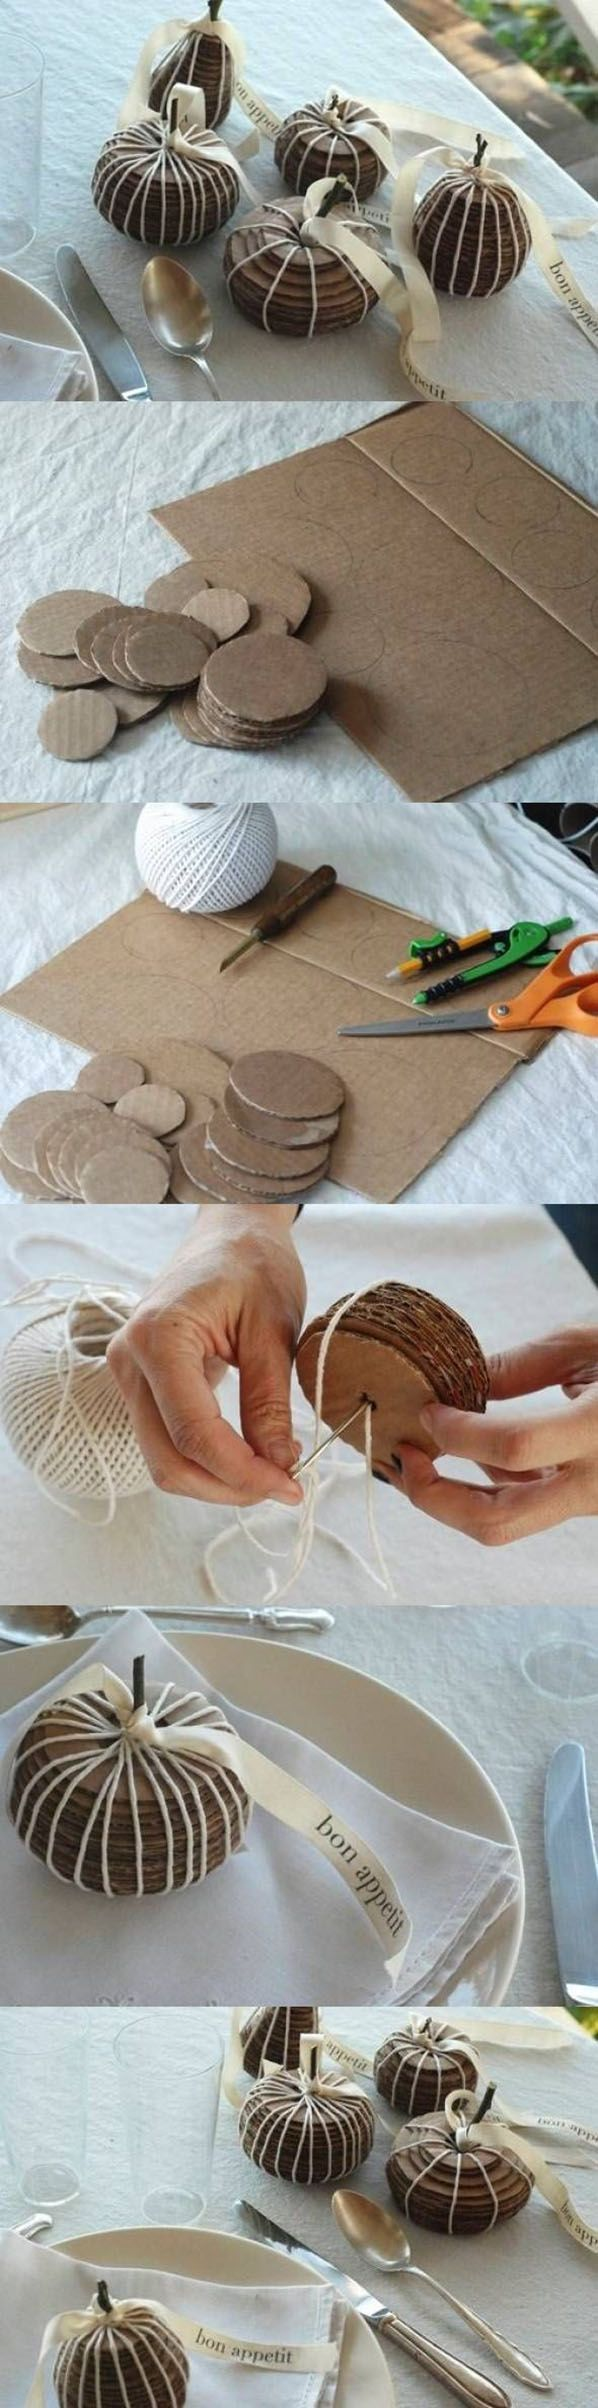 Décoration de Noël faite main - Cool Decoration Idea | DIY & Crafts Tutorials